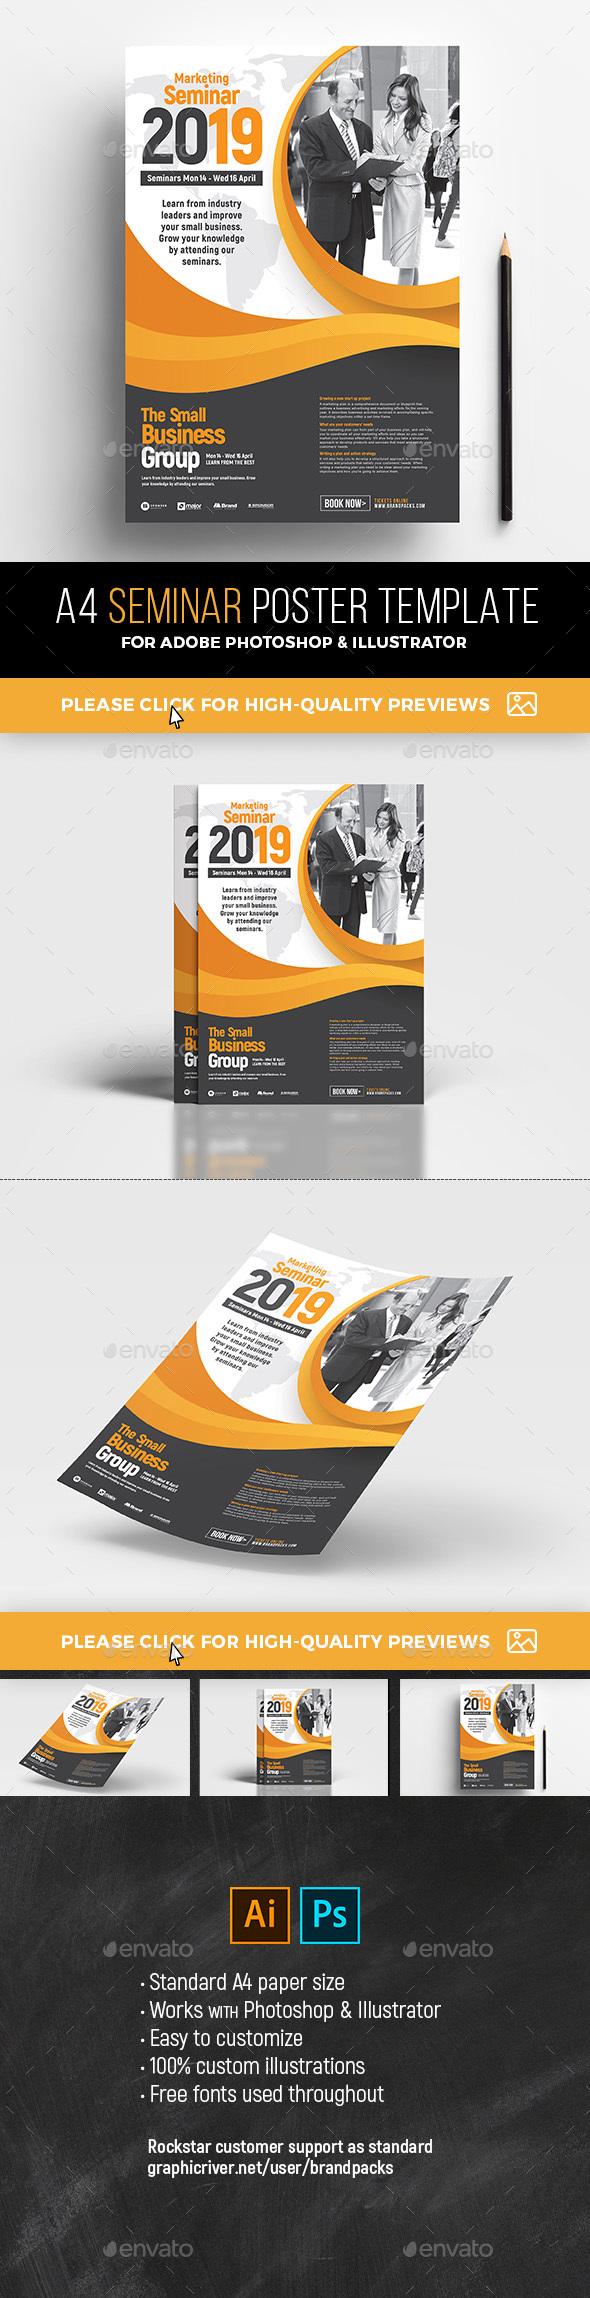 GraphicRiver A4 Seminar Poster Template v2 21194306